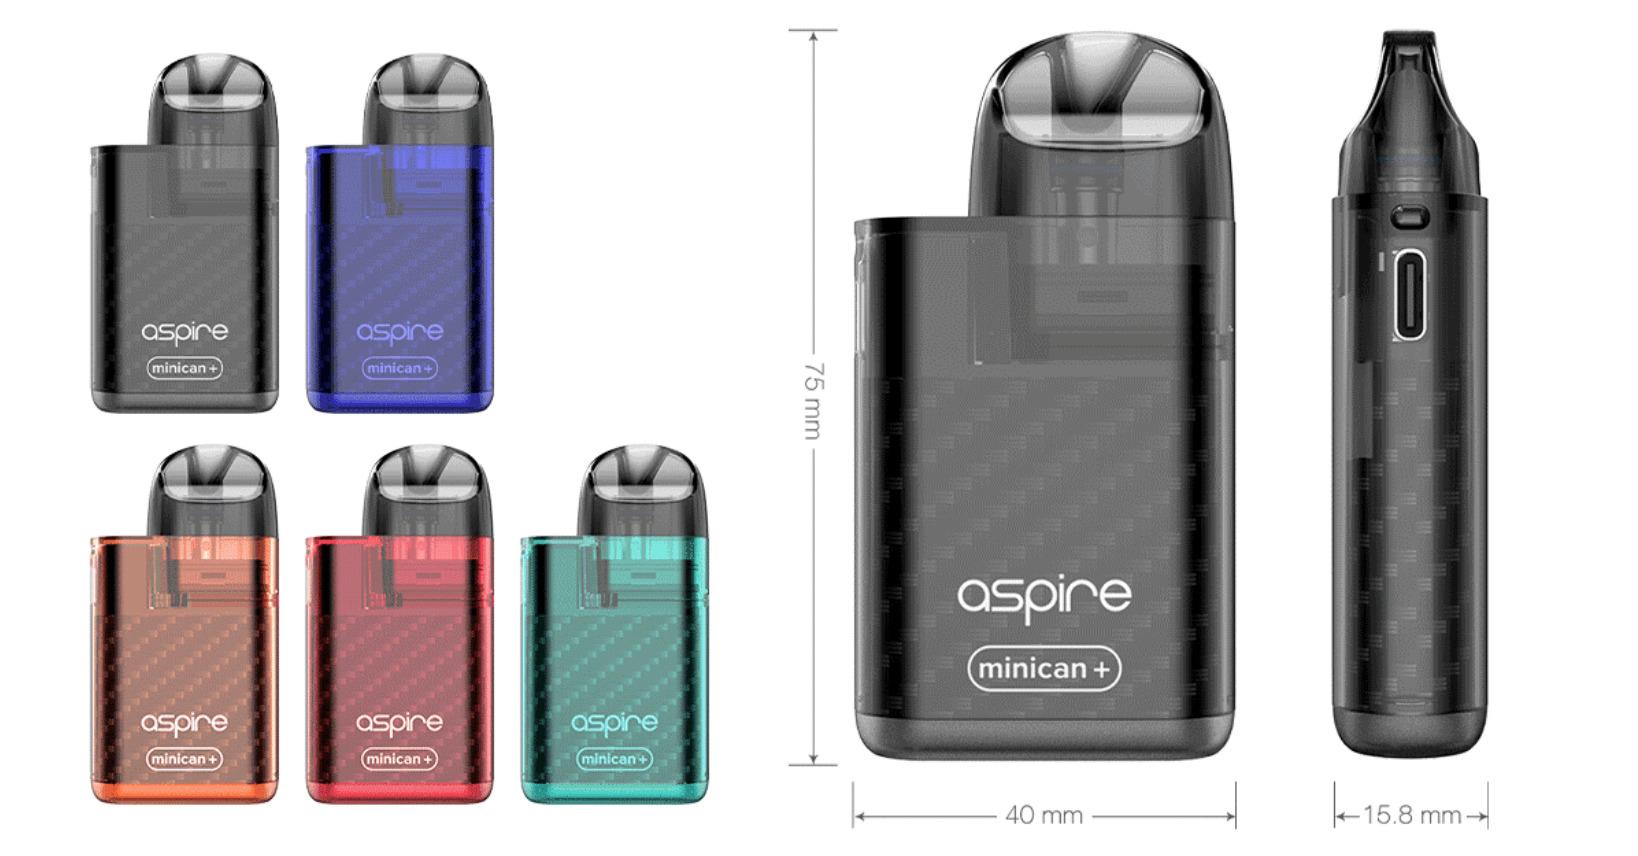 Aspire Minican+(ミニカン プラス)とは?外観や付属品を紹介!